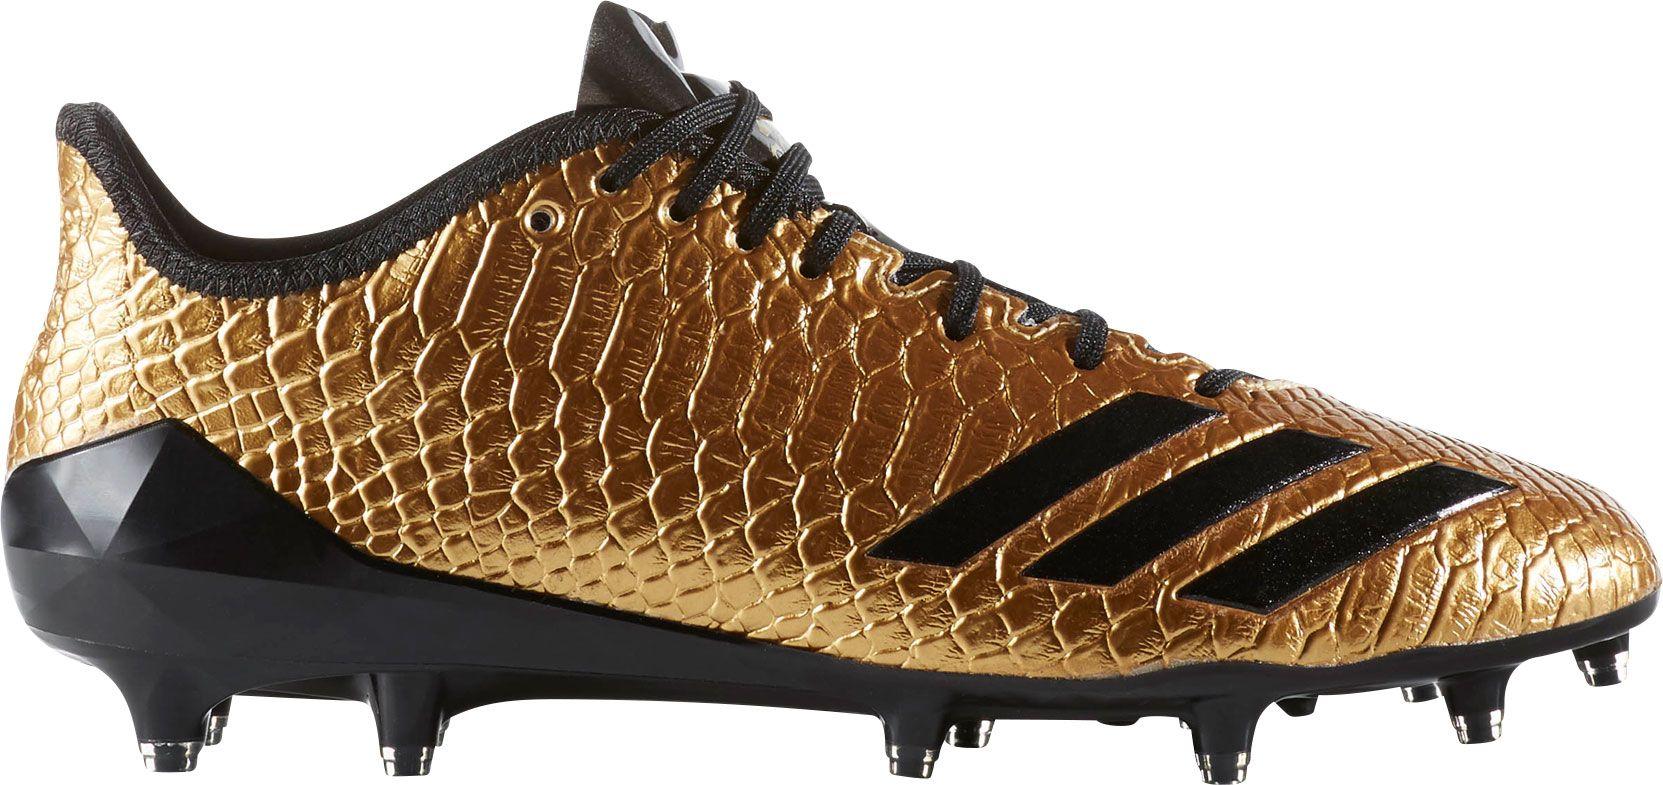 adidas 6 0 football cleats. adidas men\u0027s adizero 5-star 6.0 gold football cleats   dick\u0027s sporting goods 6 0 o